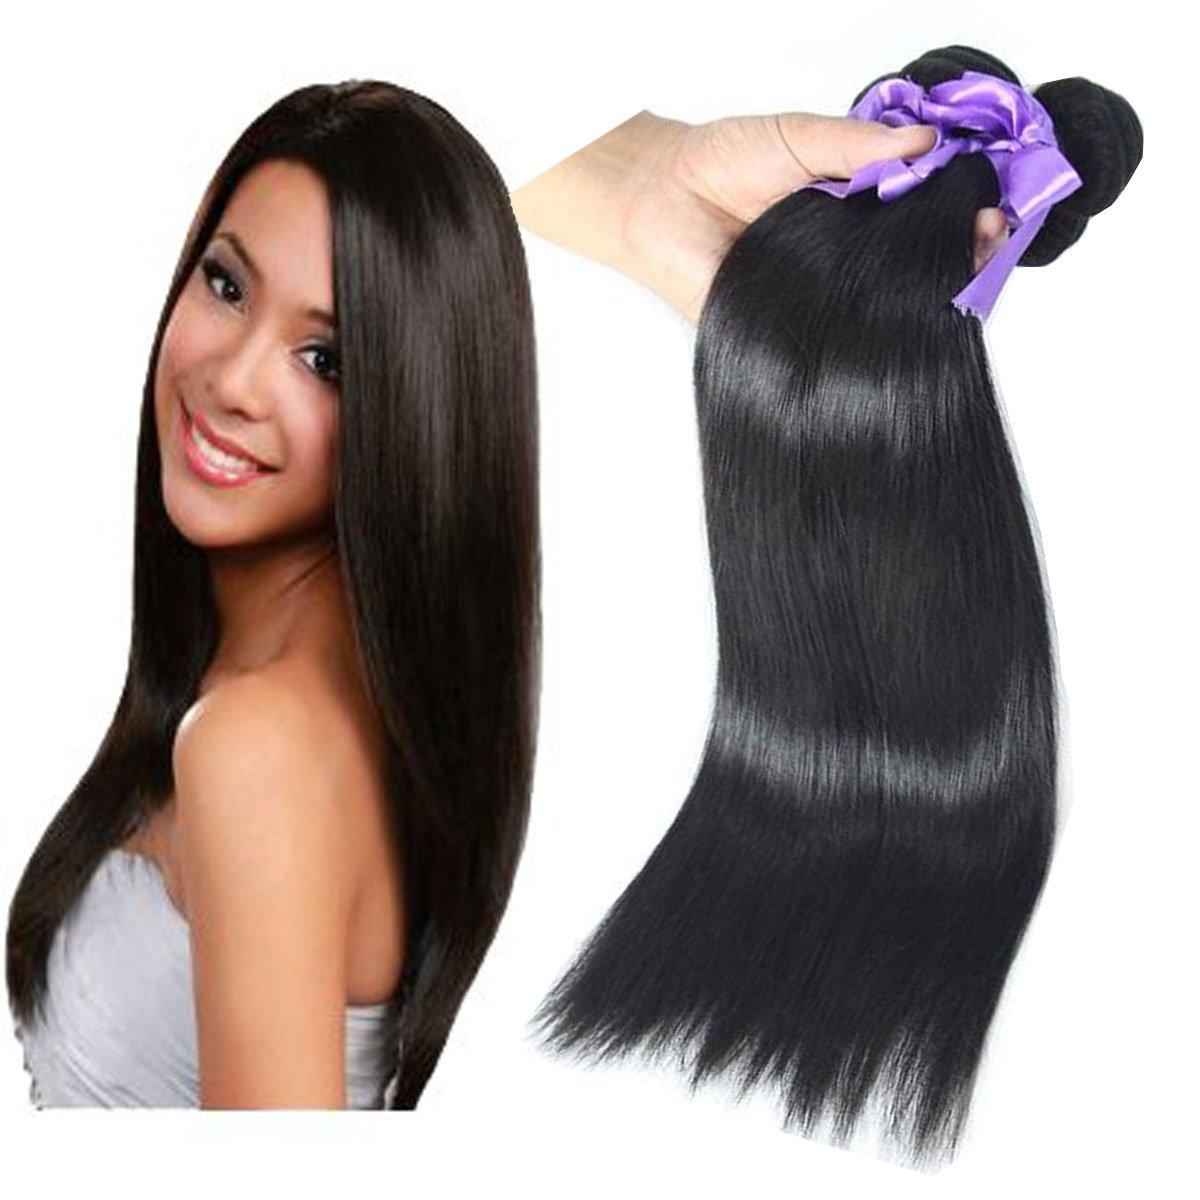 Amazon Best Buy Box 3 Bundles Wholesale Human Remy Virgin Hair